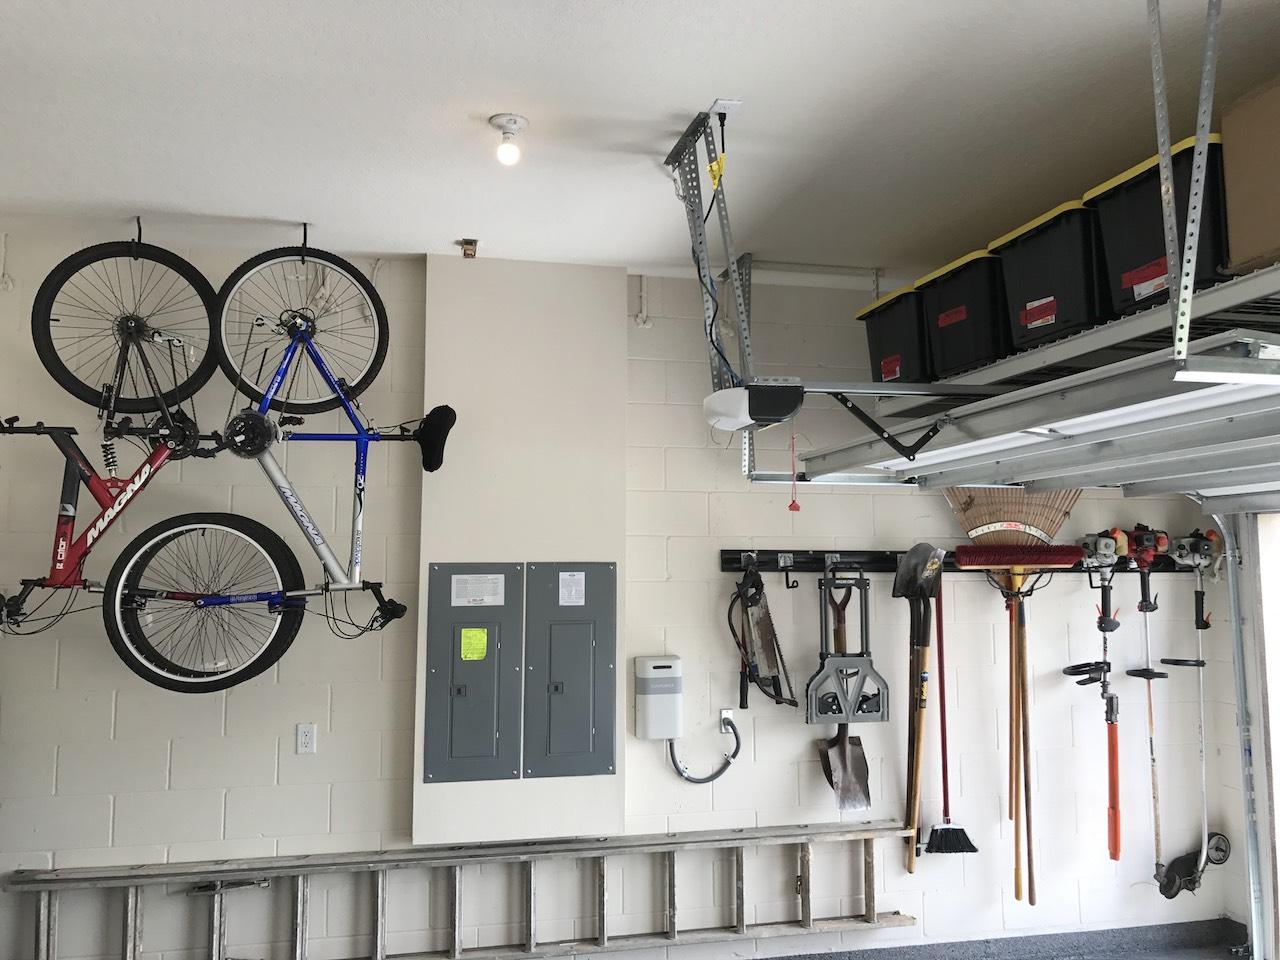 Bikes, Tools, Ladders